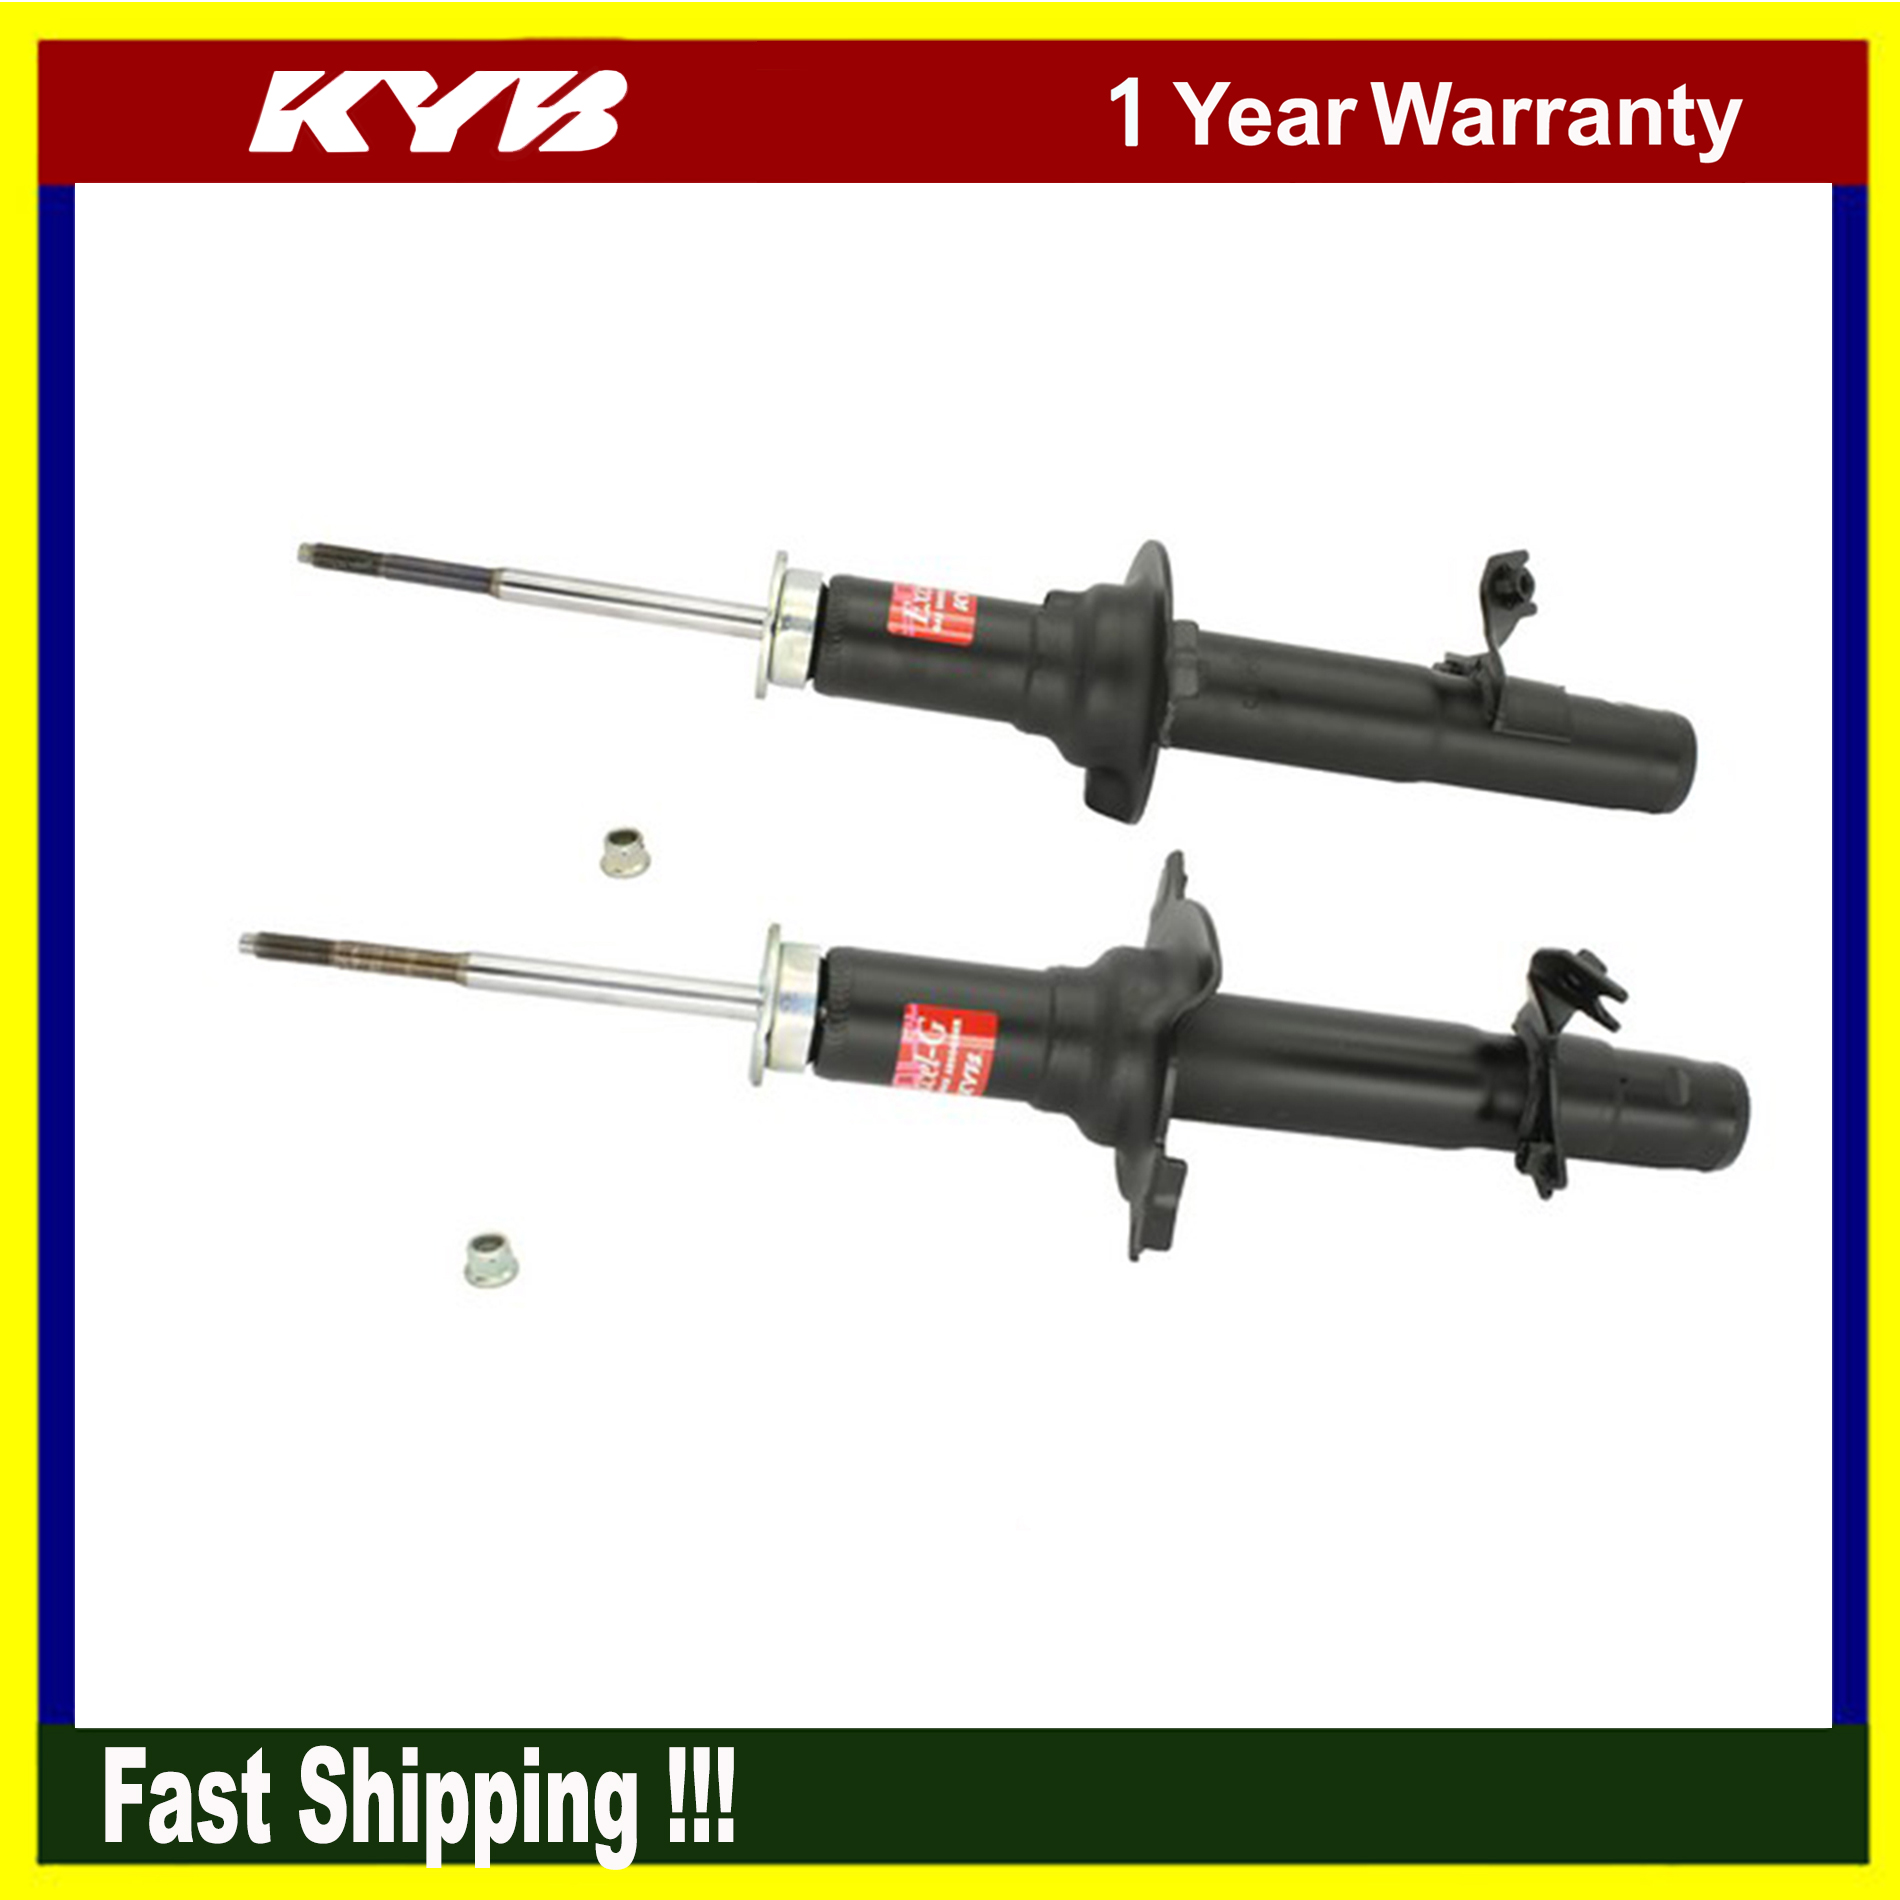 2PCs KYB Suspension Shock Struts Absorber Kits For 1996